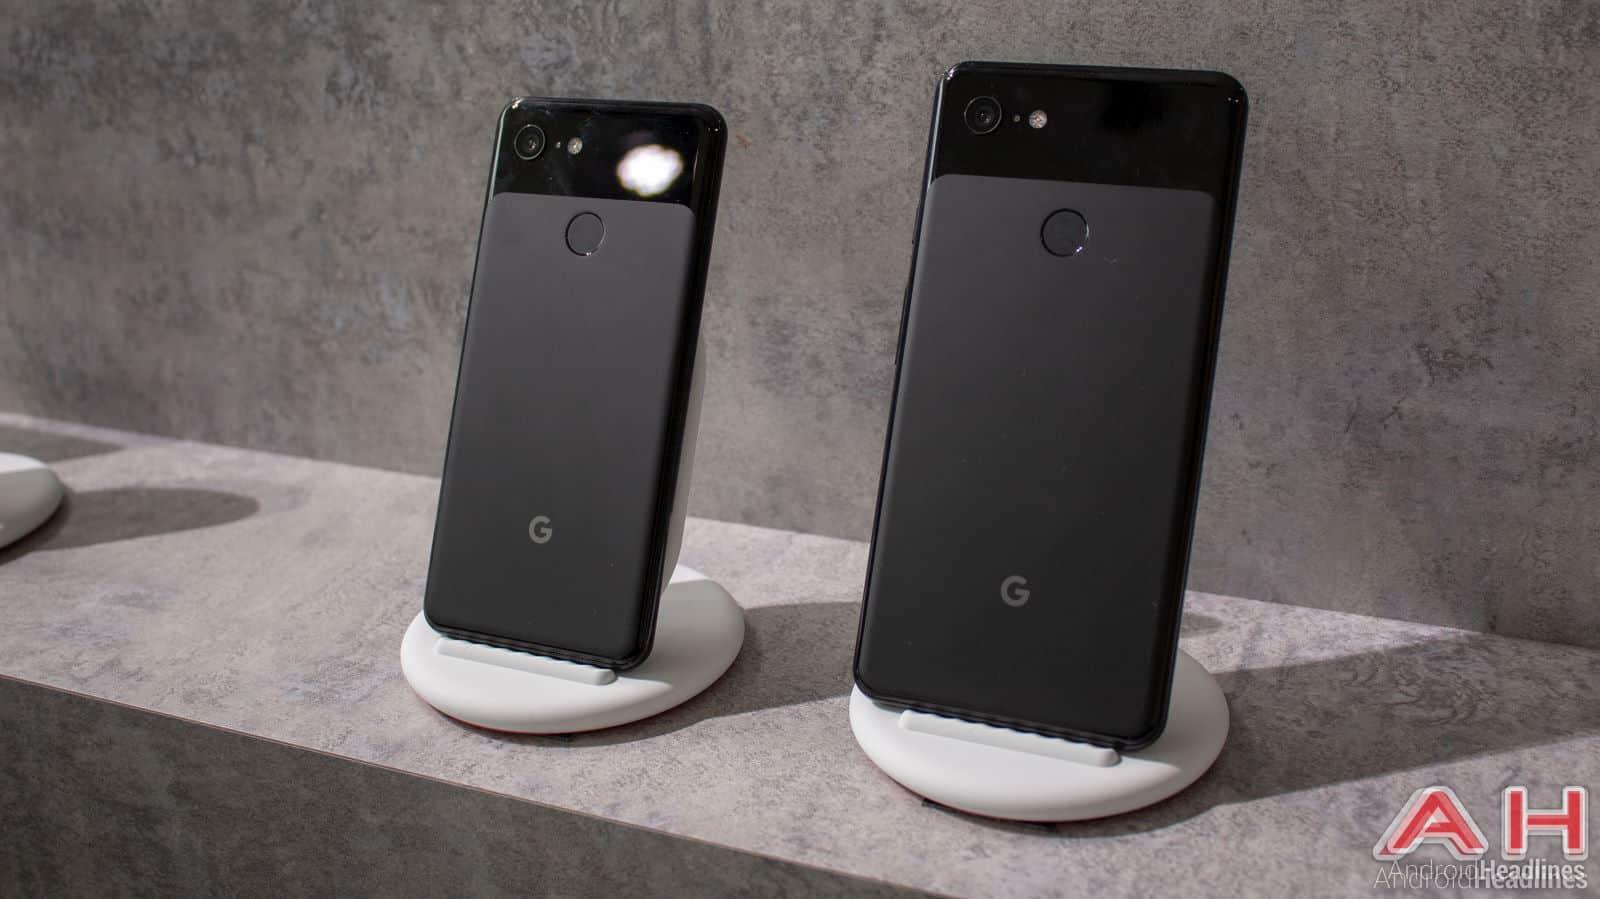 Google Pixel 3 3 XL Batch 2 AH 5